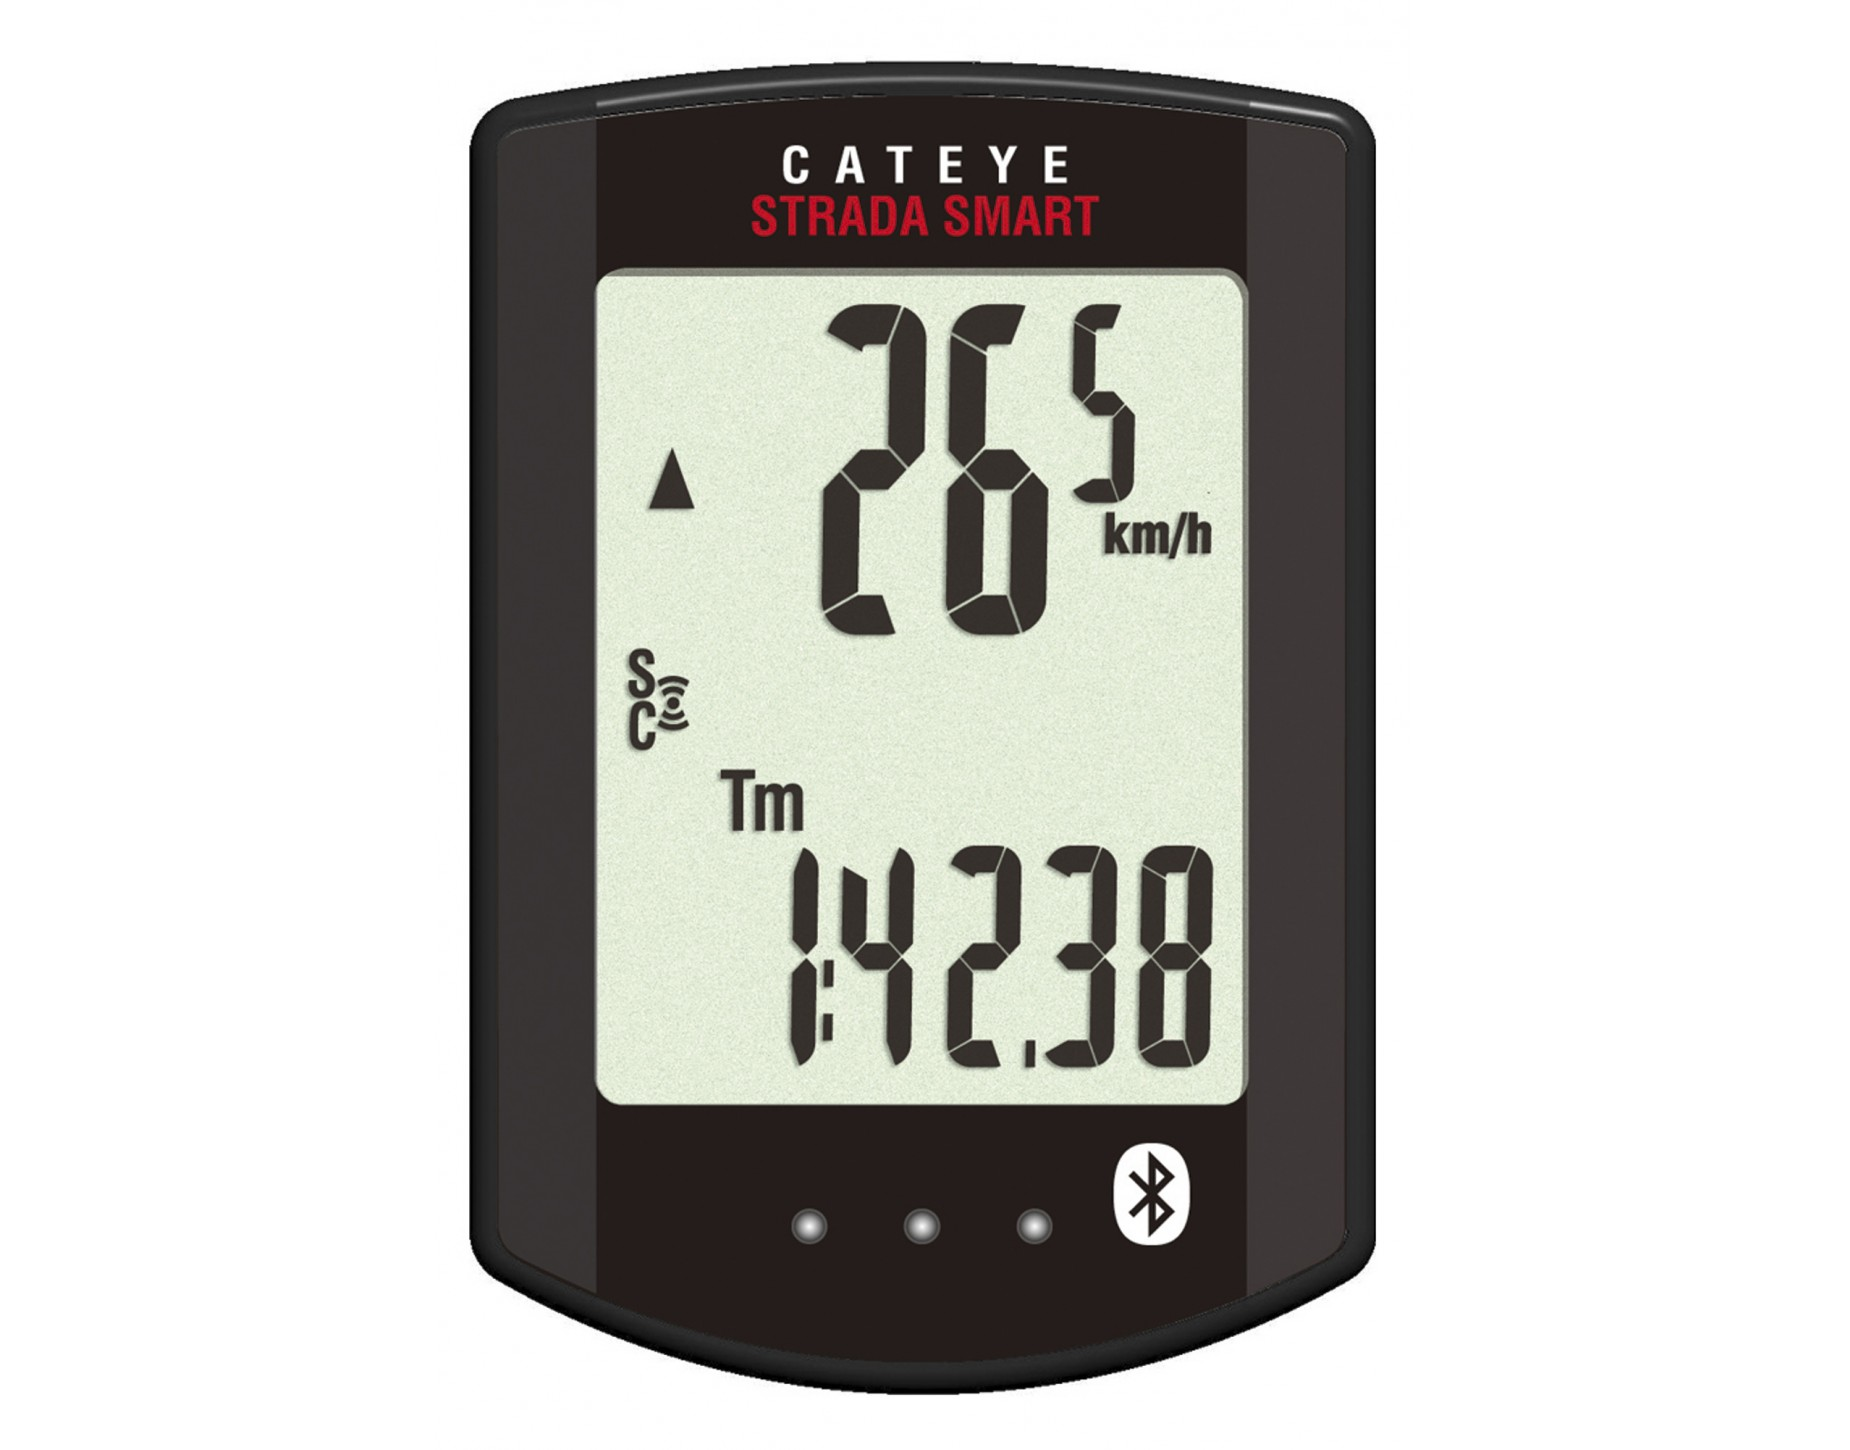 CATEYE ไมล์ไร้สาย STRADA SMART, CC-RD500B, ขายเฉพาะตัวเรือนไมล์